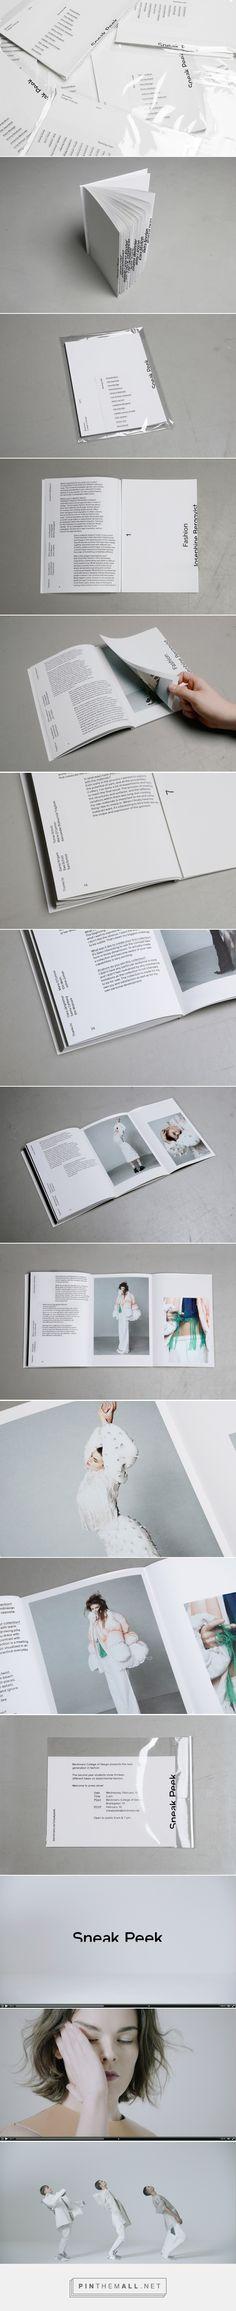 Sneak Peek by Johanna Nyberg